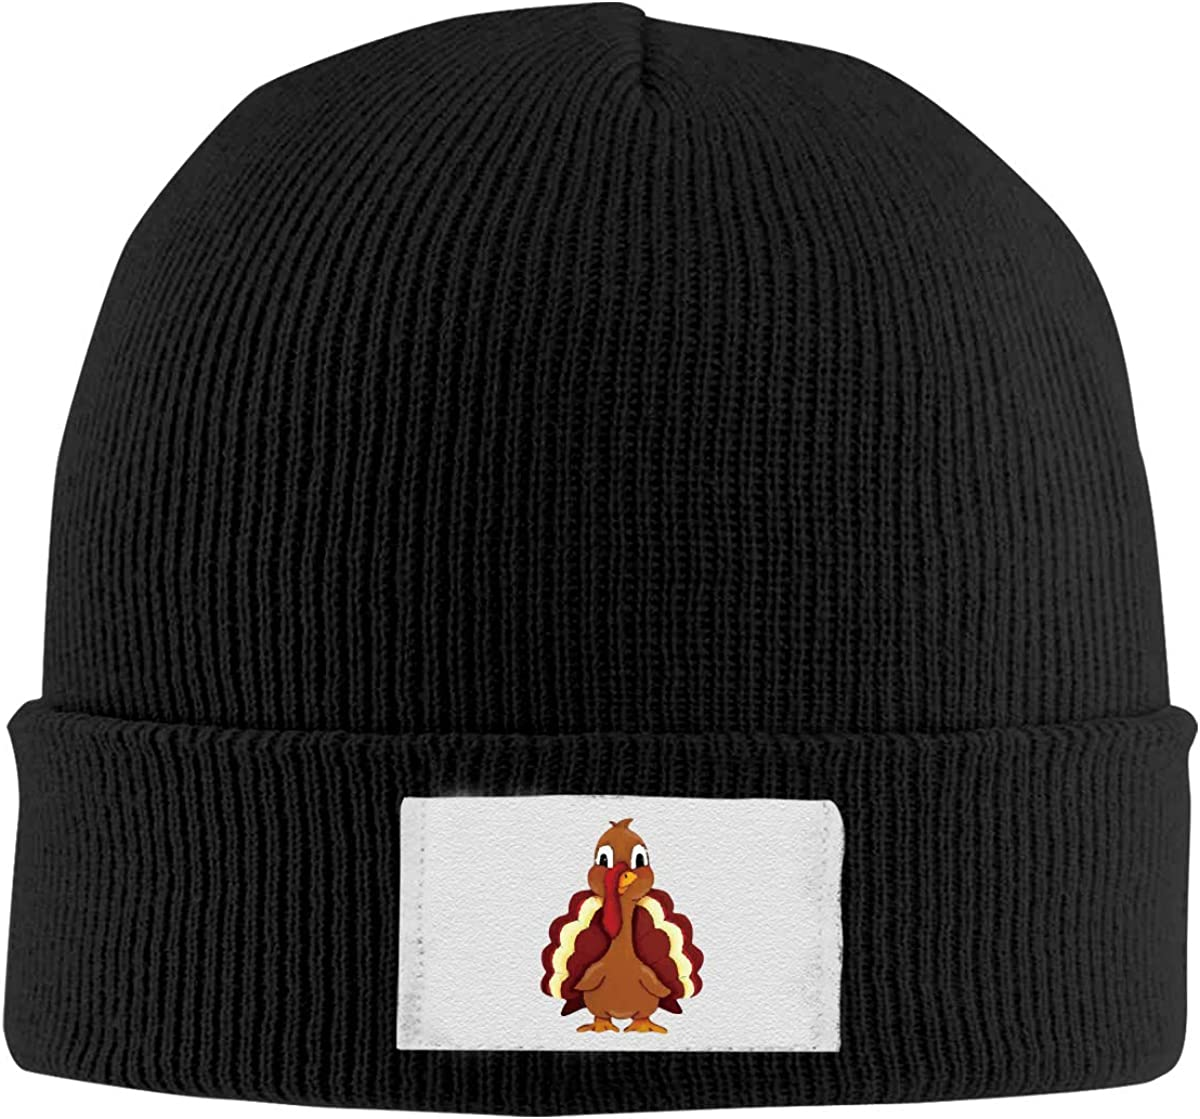 Dunpaiaa Skull Caps Painted Cute Turkey Winter Warm Knit Hats Stretchy Cuff Beanie Hat Black